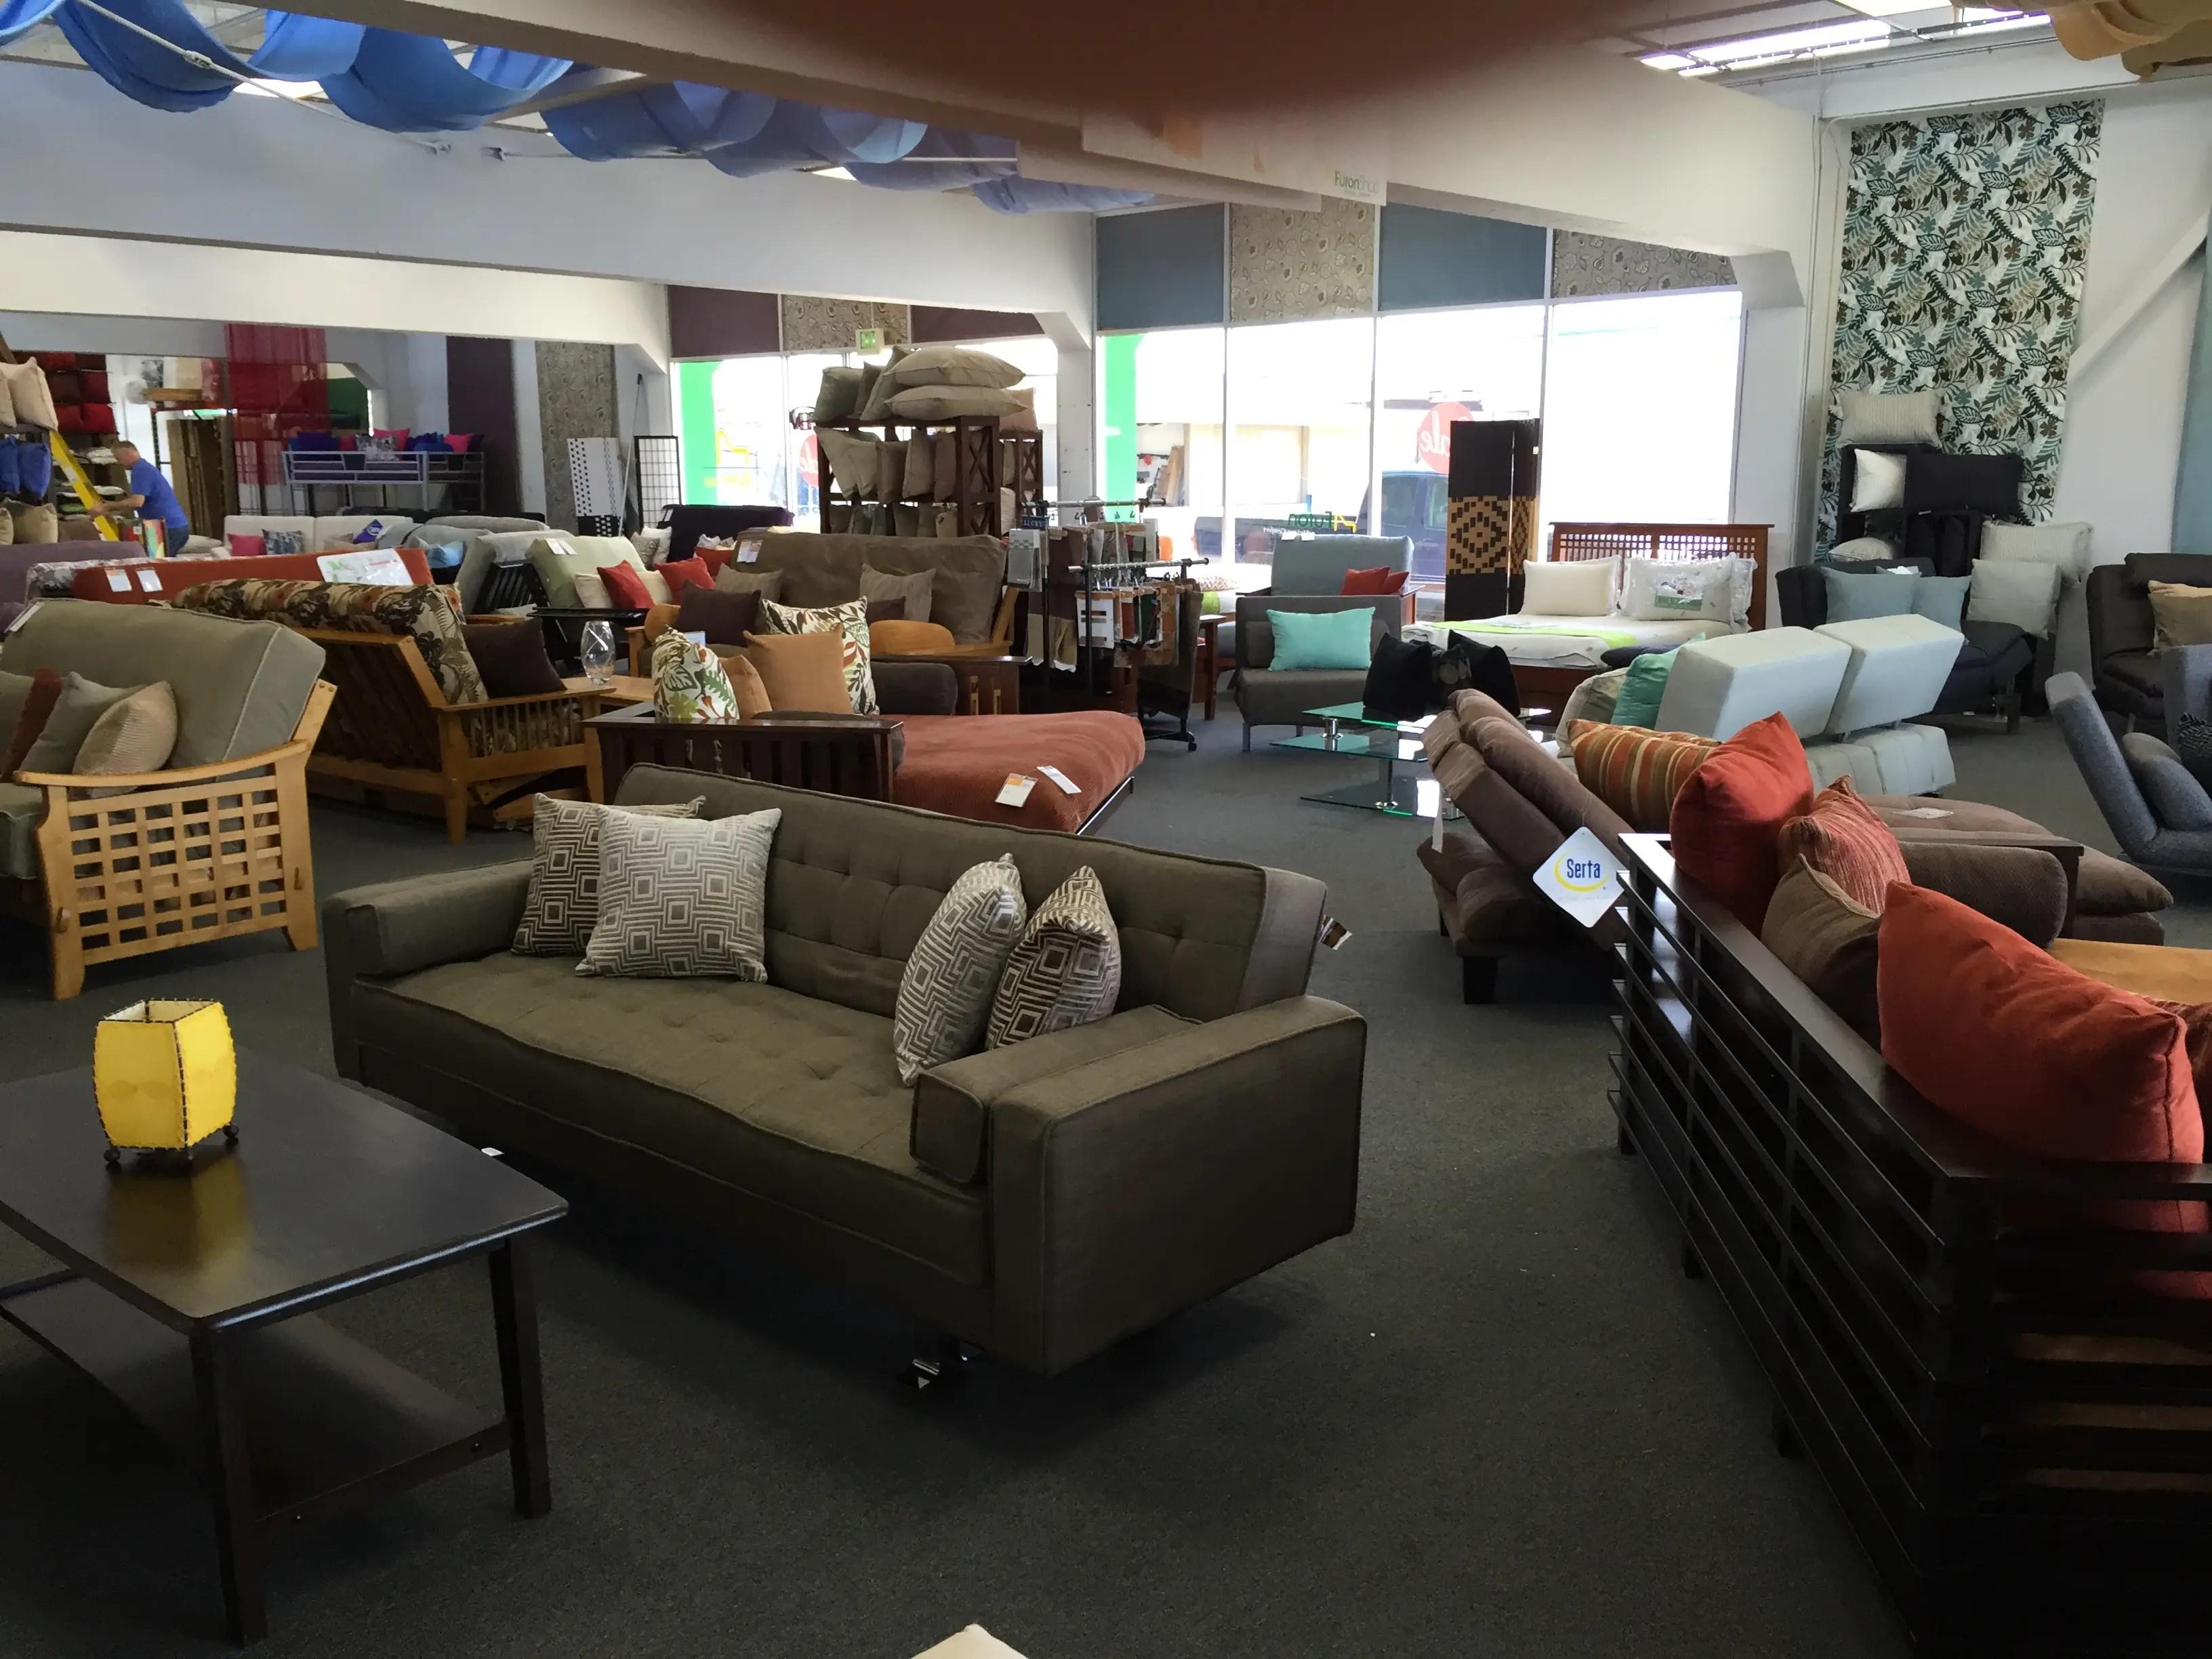 sofa farmers market san jose rooms to go sectional sleeper sofas futons beds mattresses